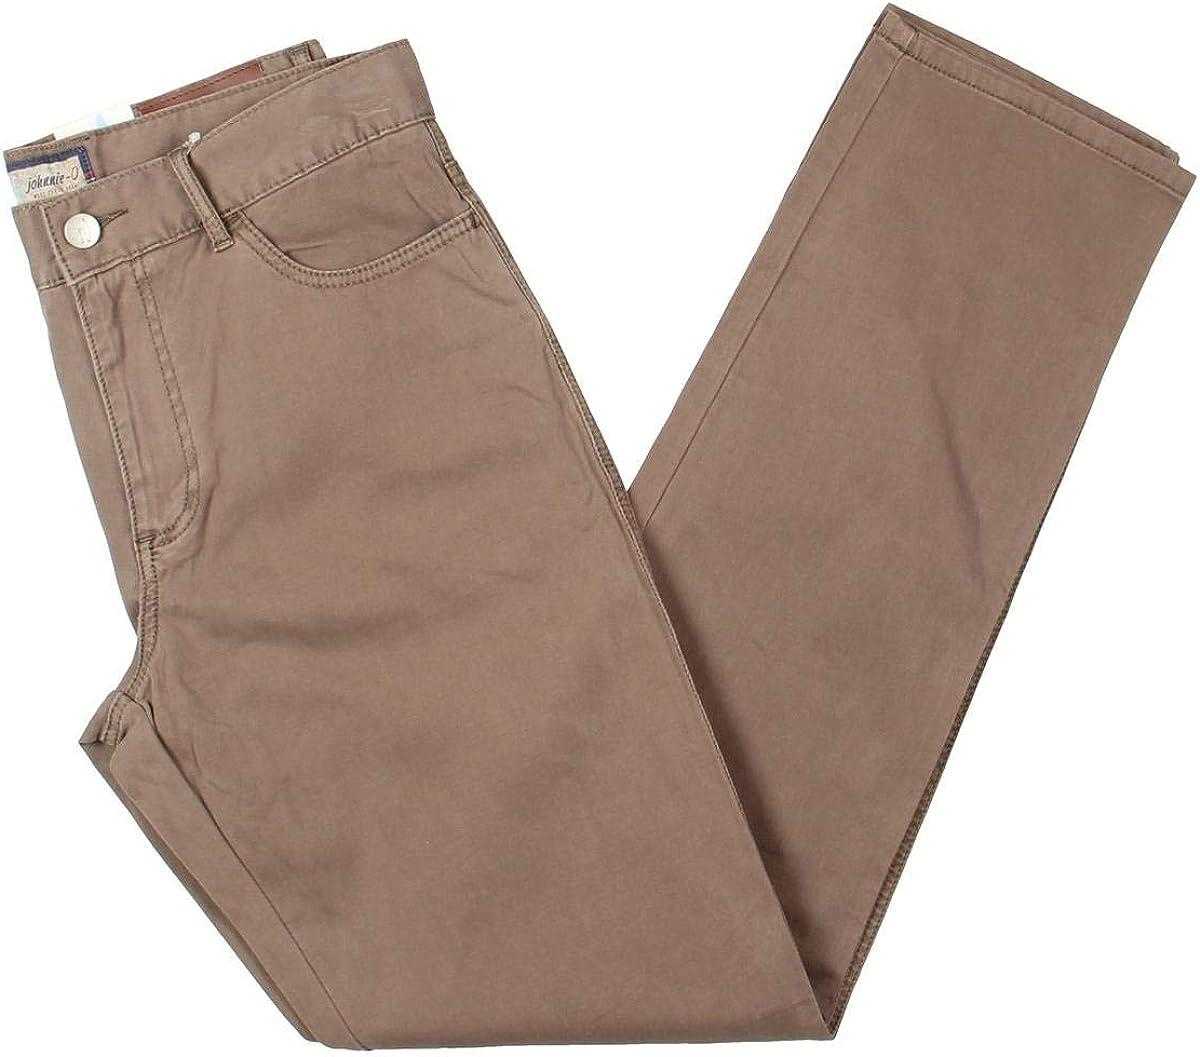 johnnie-O Mens West Coast Prep Casual Chino Pants, Brown, 32W x 34L